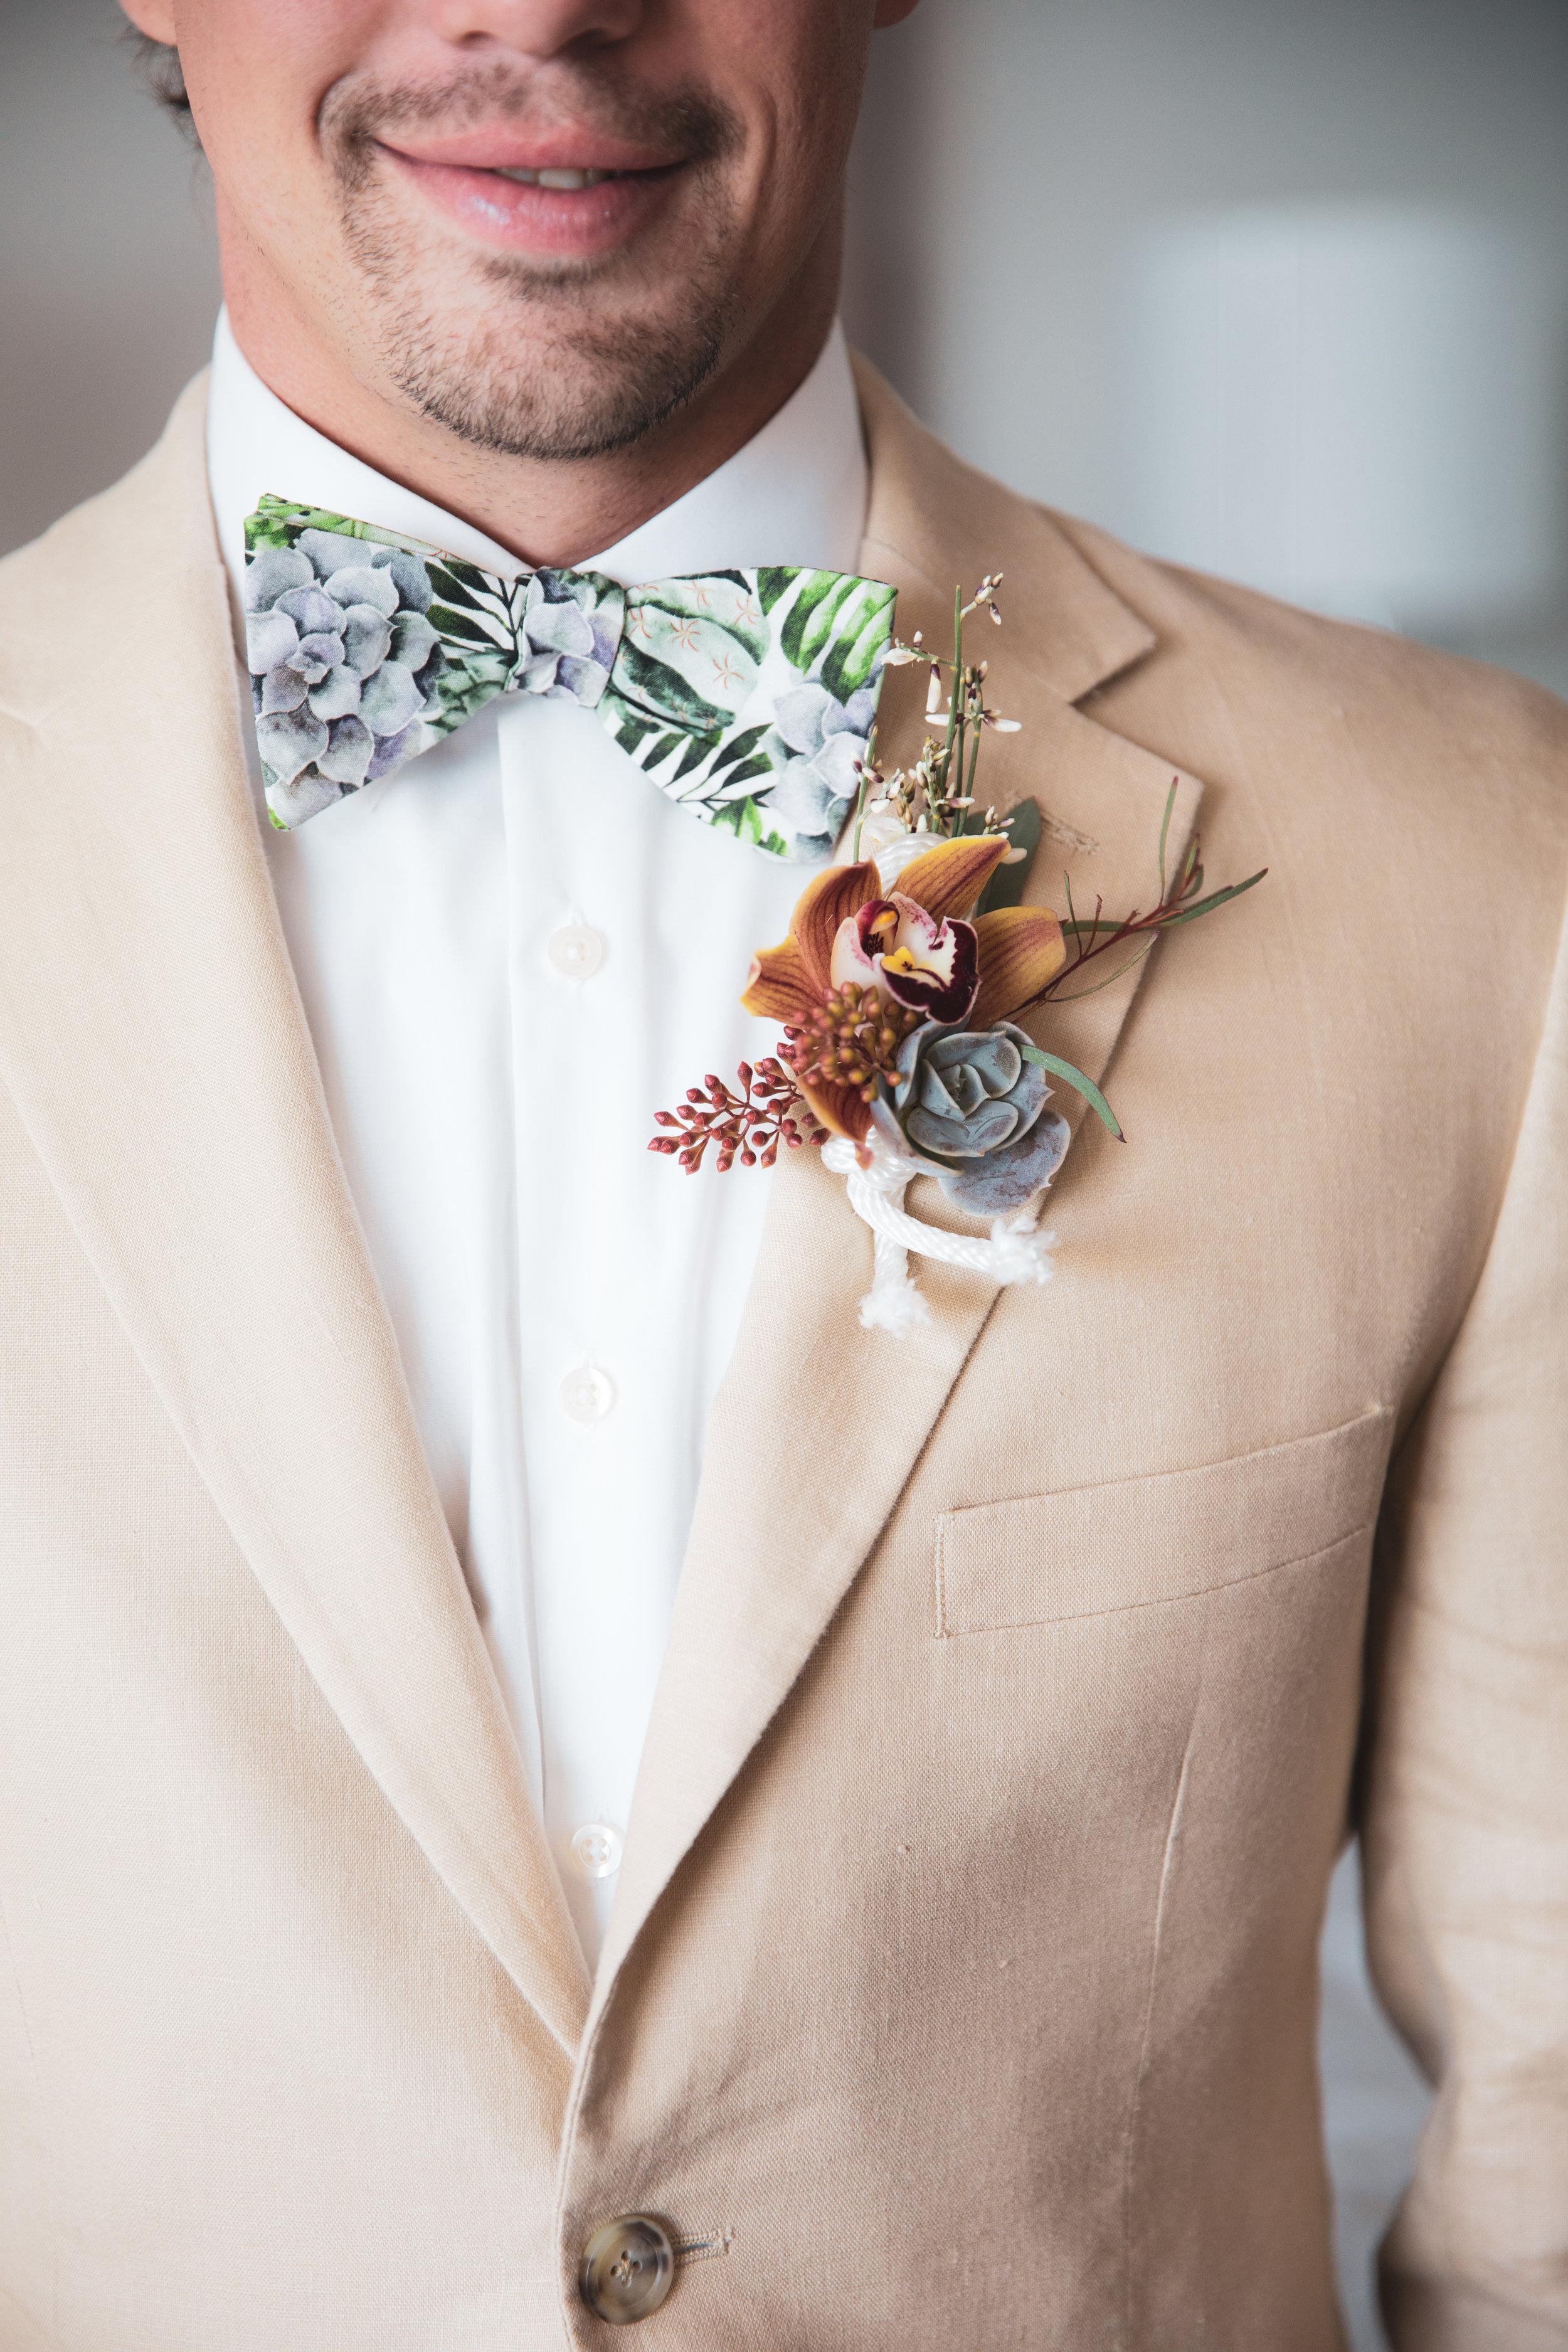 key largo florida beach wedding © kelilina photography 20190316154226-1.jpg